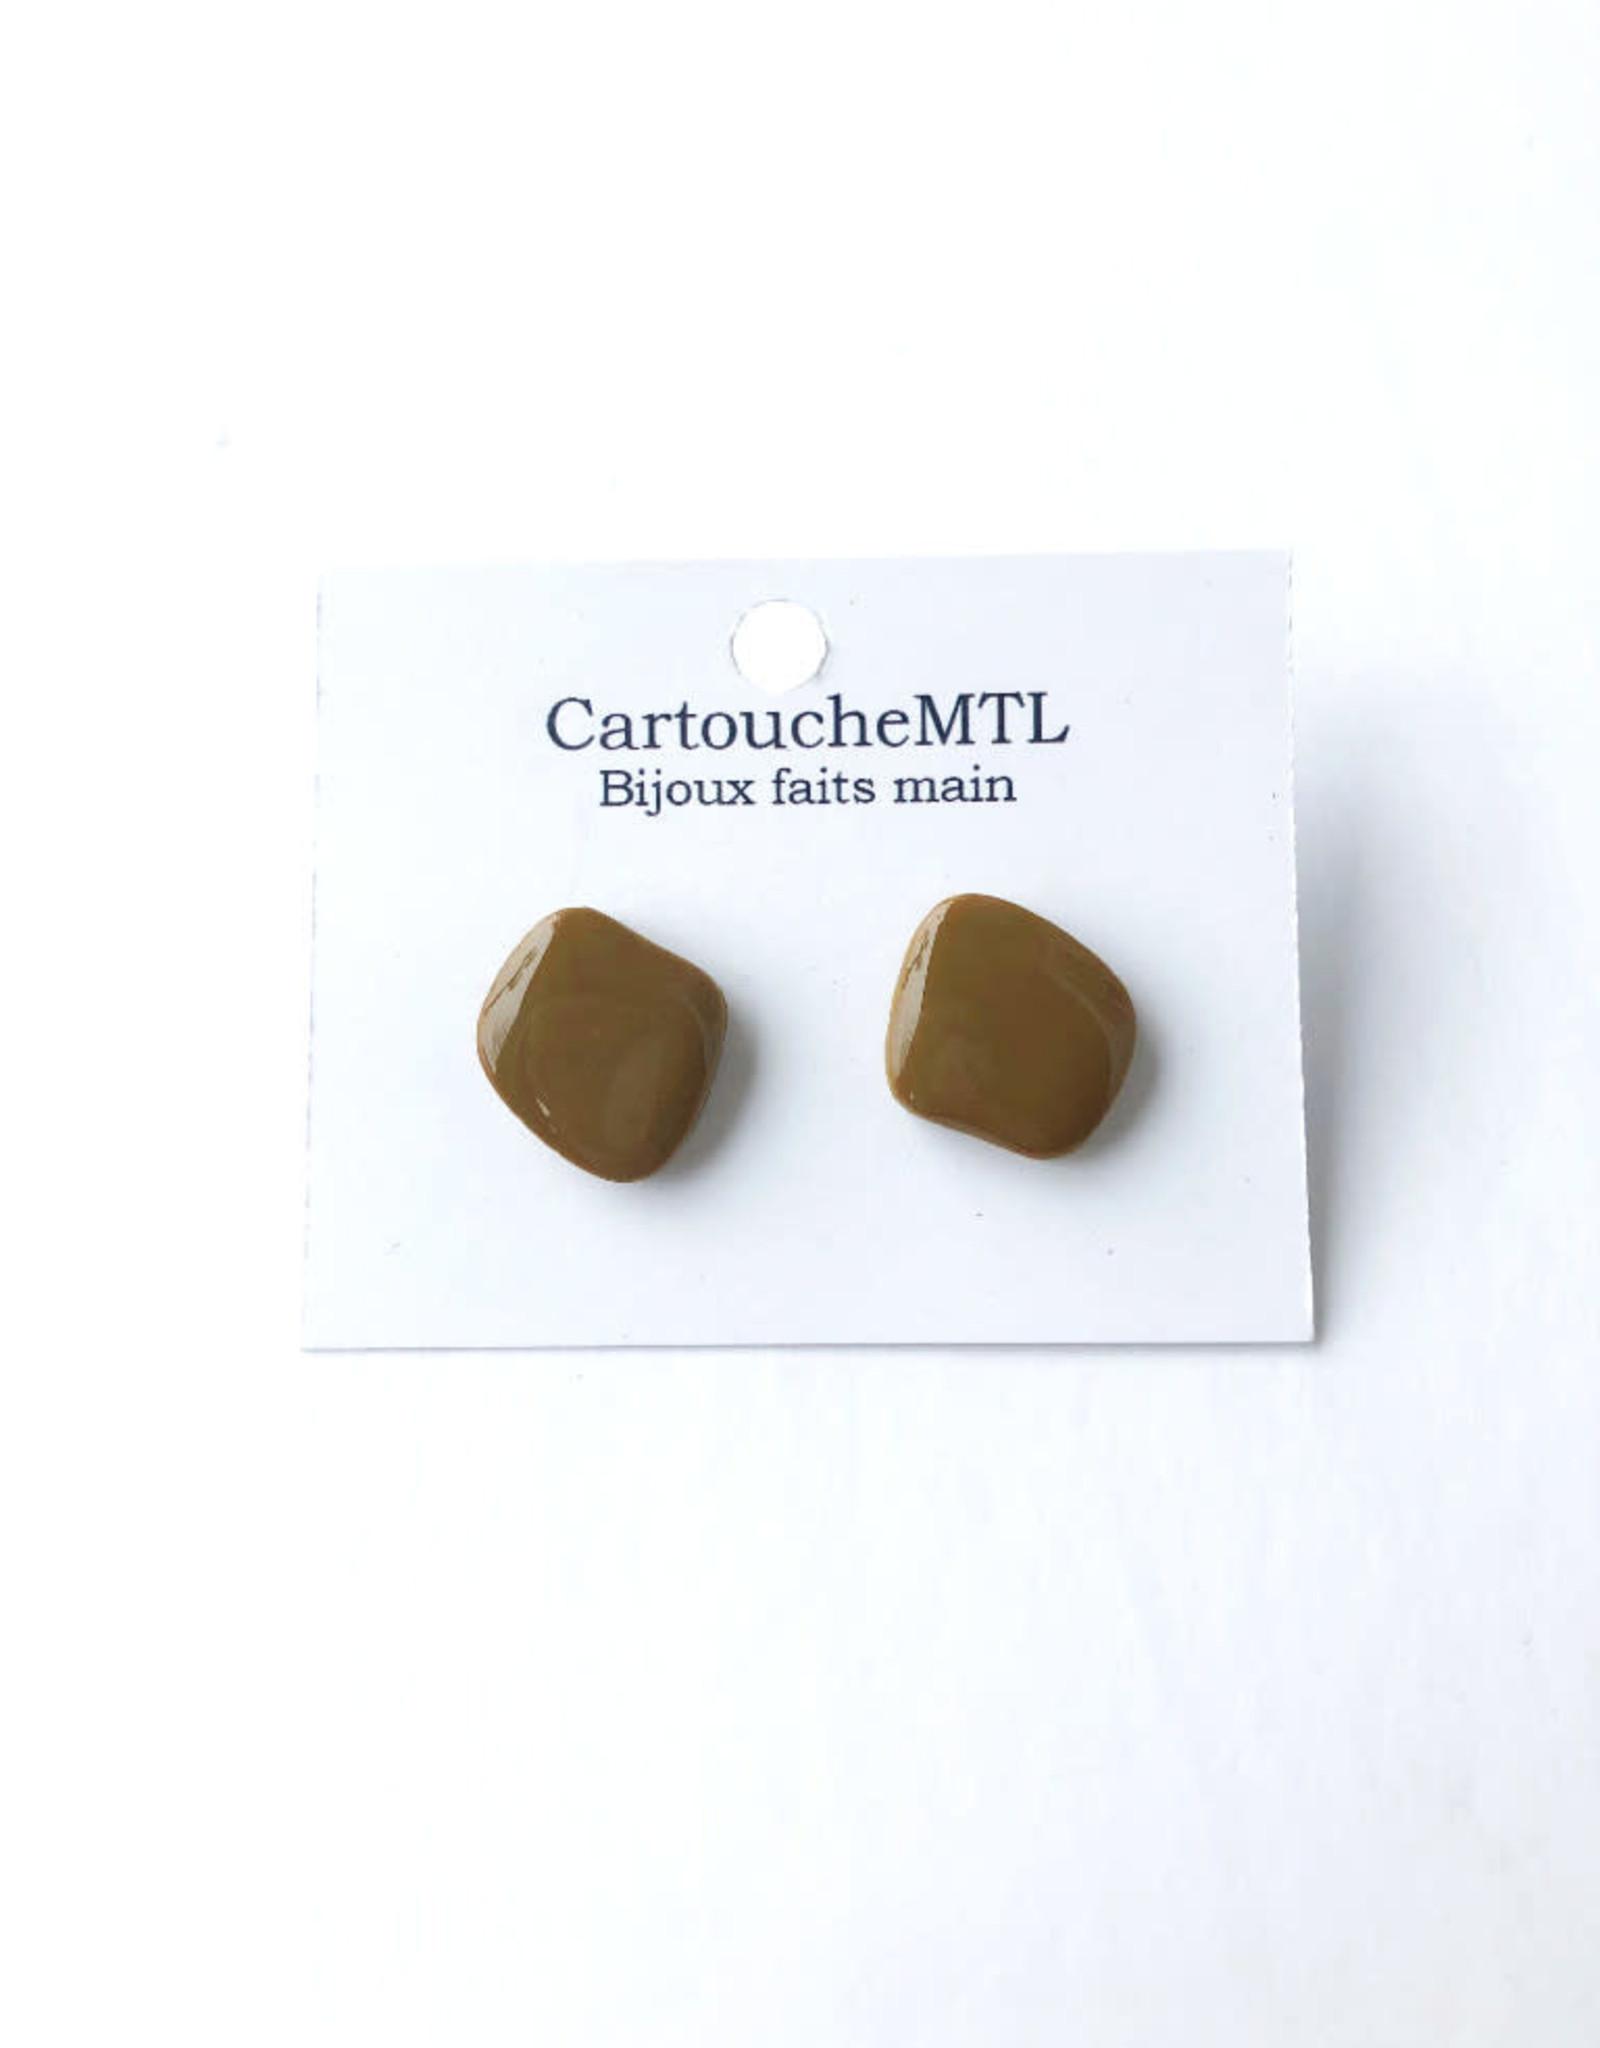 CartoucheMTL Clous d'oreilles CartoucheMTL Moutarde